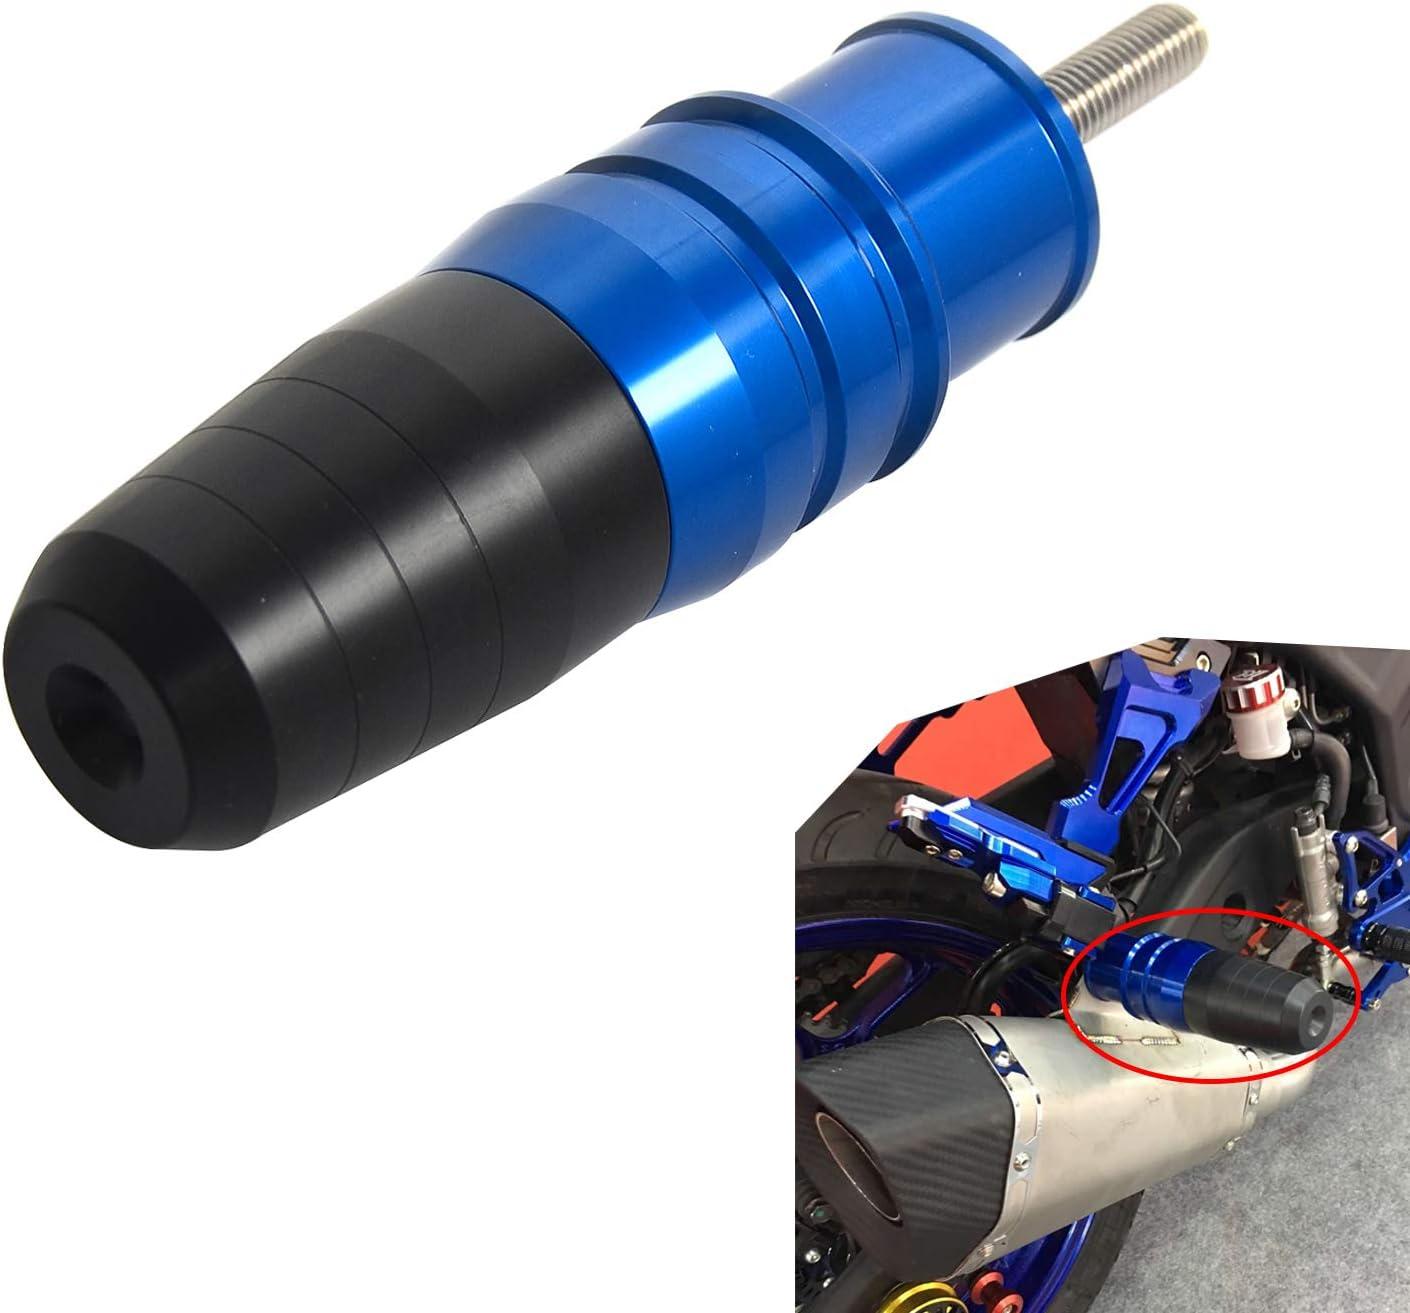 Nicecnc Titanium Crash Pads Exhaust Sliders Body Protector Replace YAMAHA /YZF-R3//MT-03 2015-2016,HONDA CB1100 2010-2016 CB1100EX 2013 2014 2015